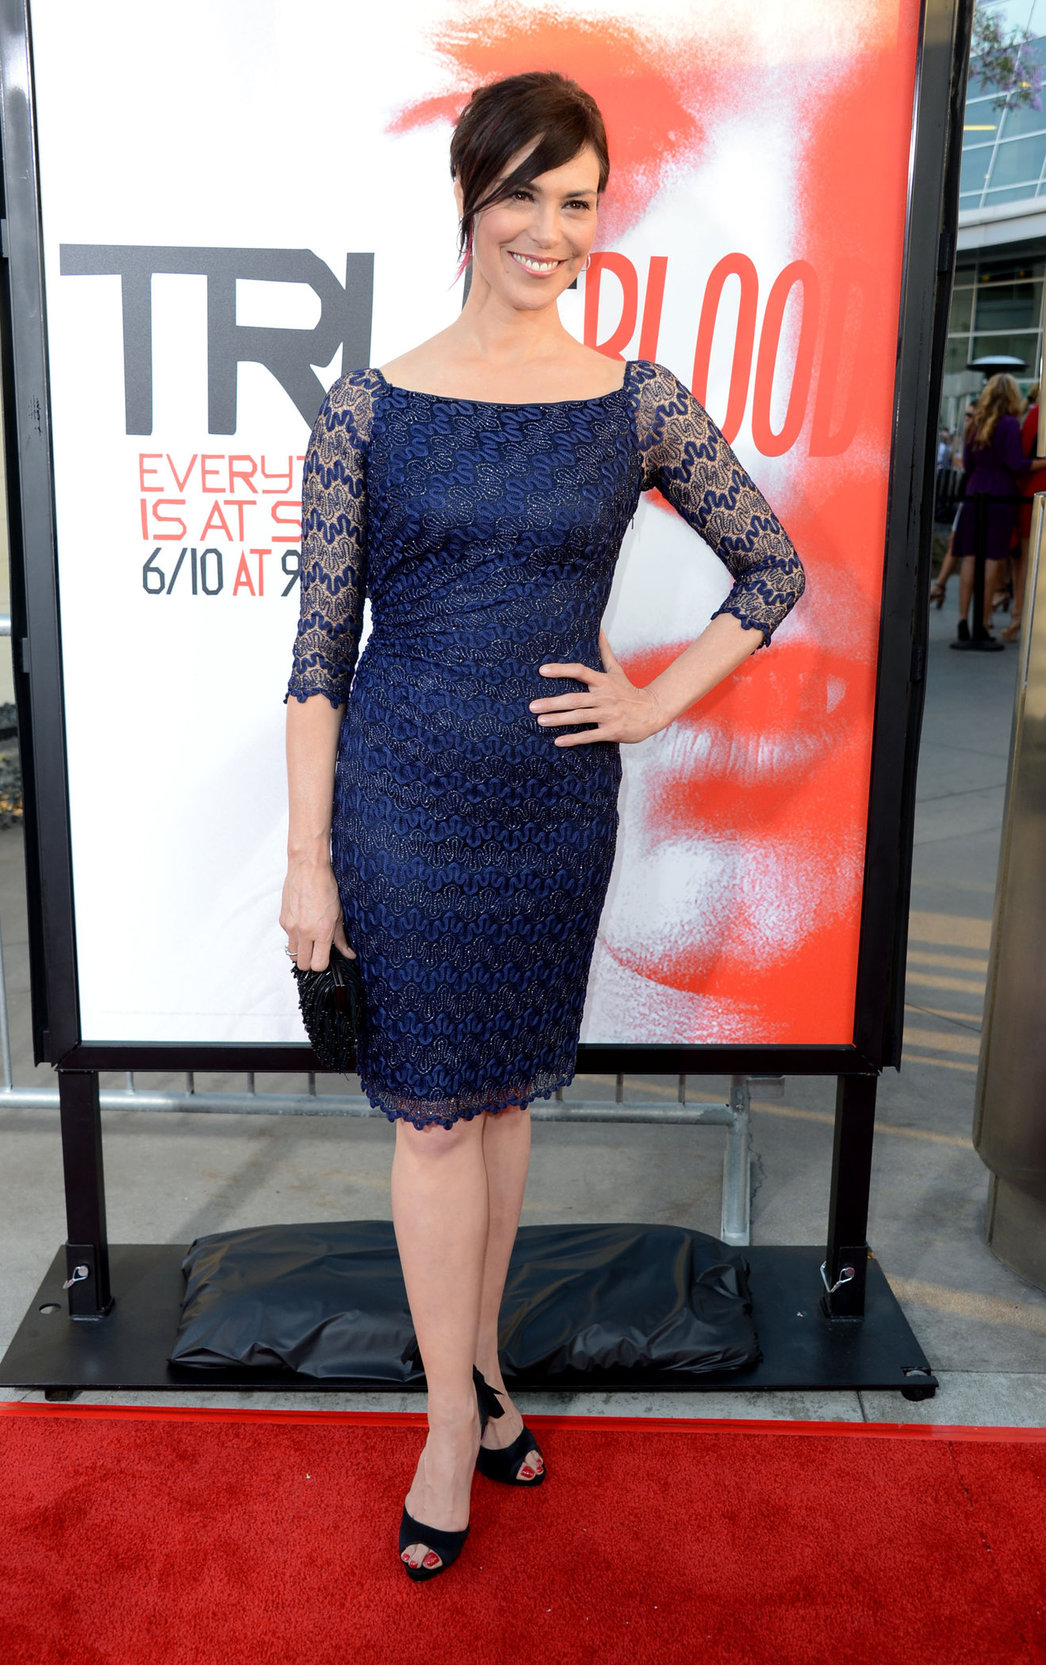 Michelle Forbes - True Blood Season 5 premiere in Los Angeles (May 30, 2012)